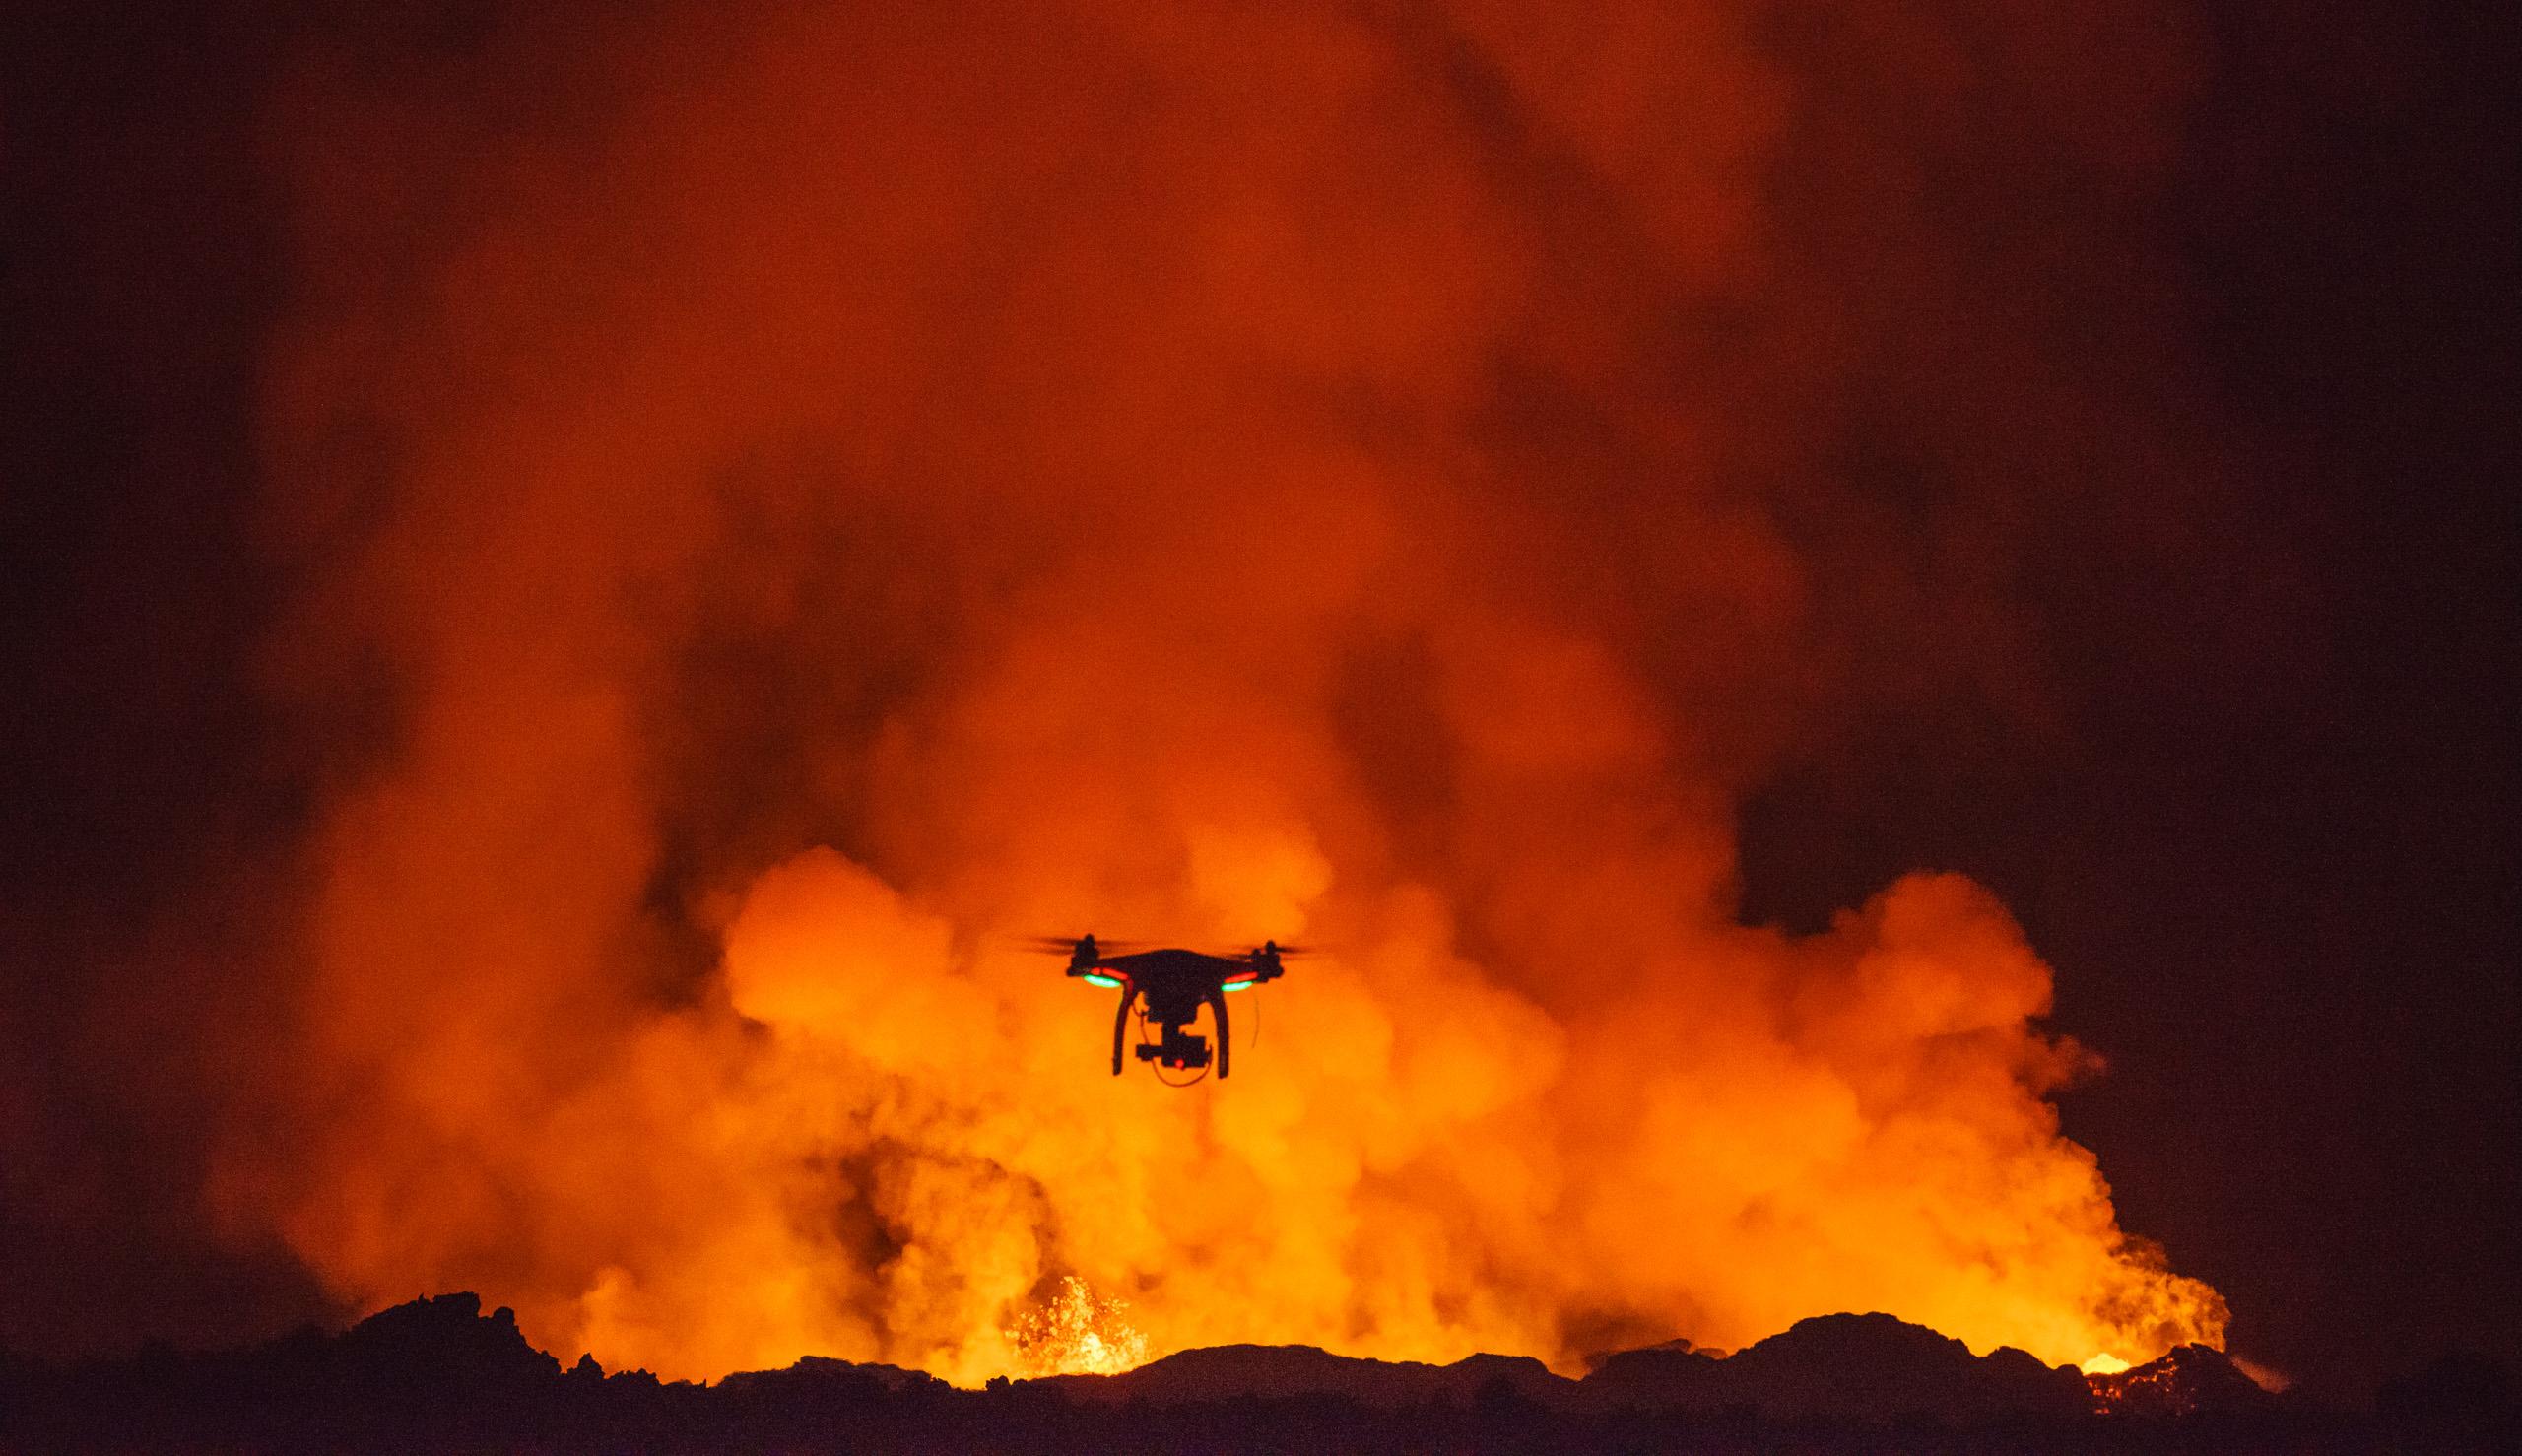 A DJI Phantom 2 flying near the Holuhraun volcano eruption, Bardarbunga volcanic system, Iceland.